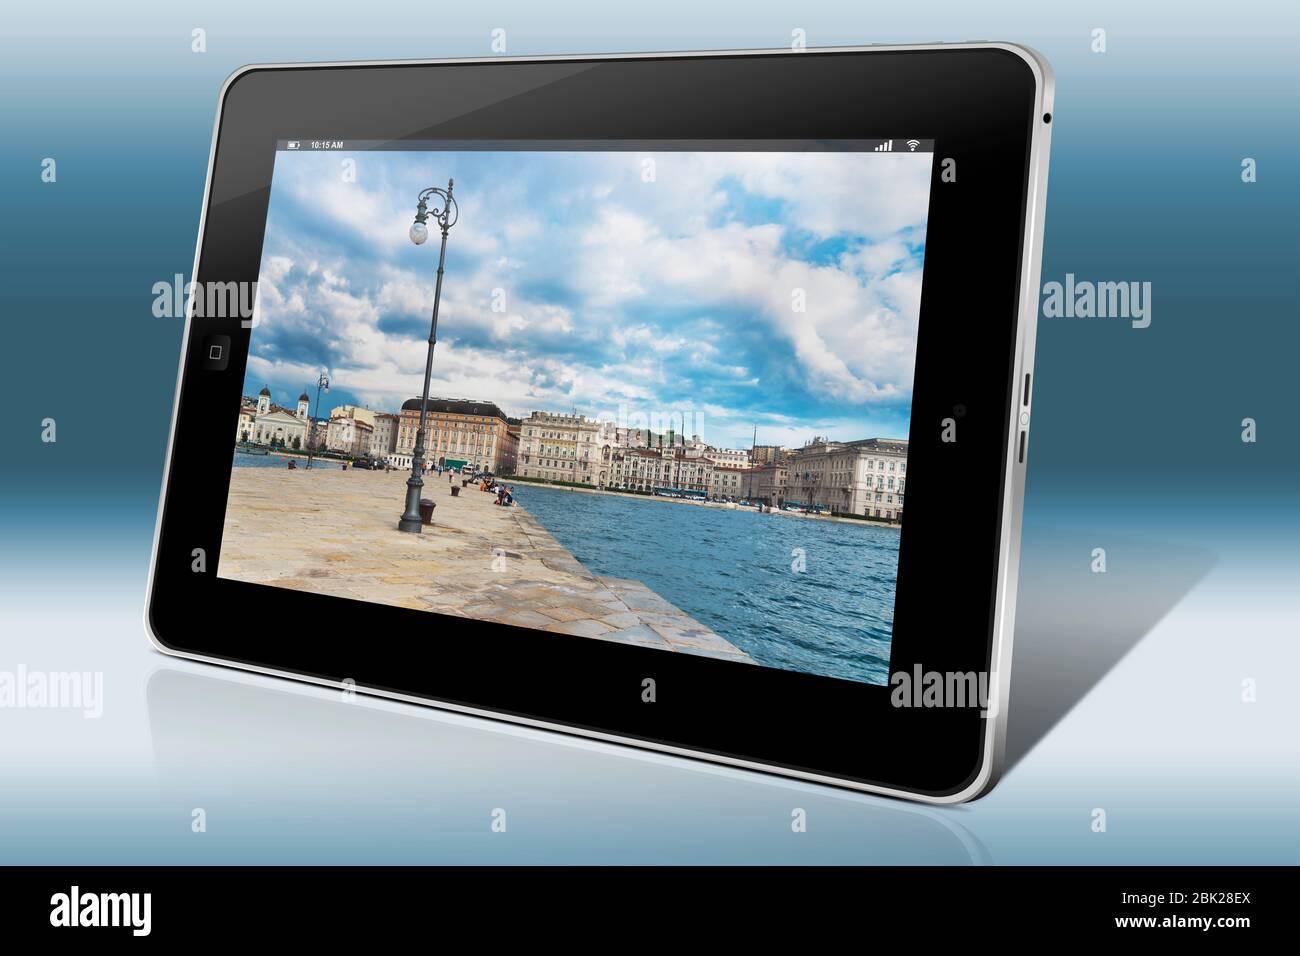 City view from Molo Audace to Trieste, Friuli-Venezia Giulia, Italy, Europe Stock Photo